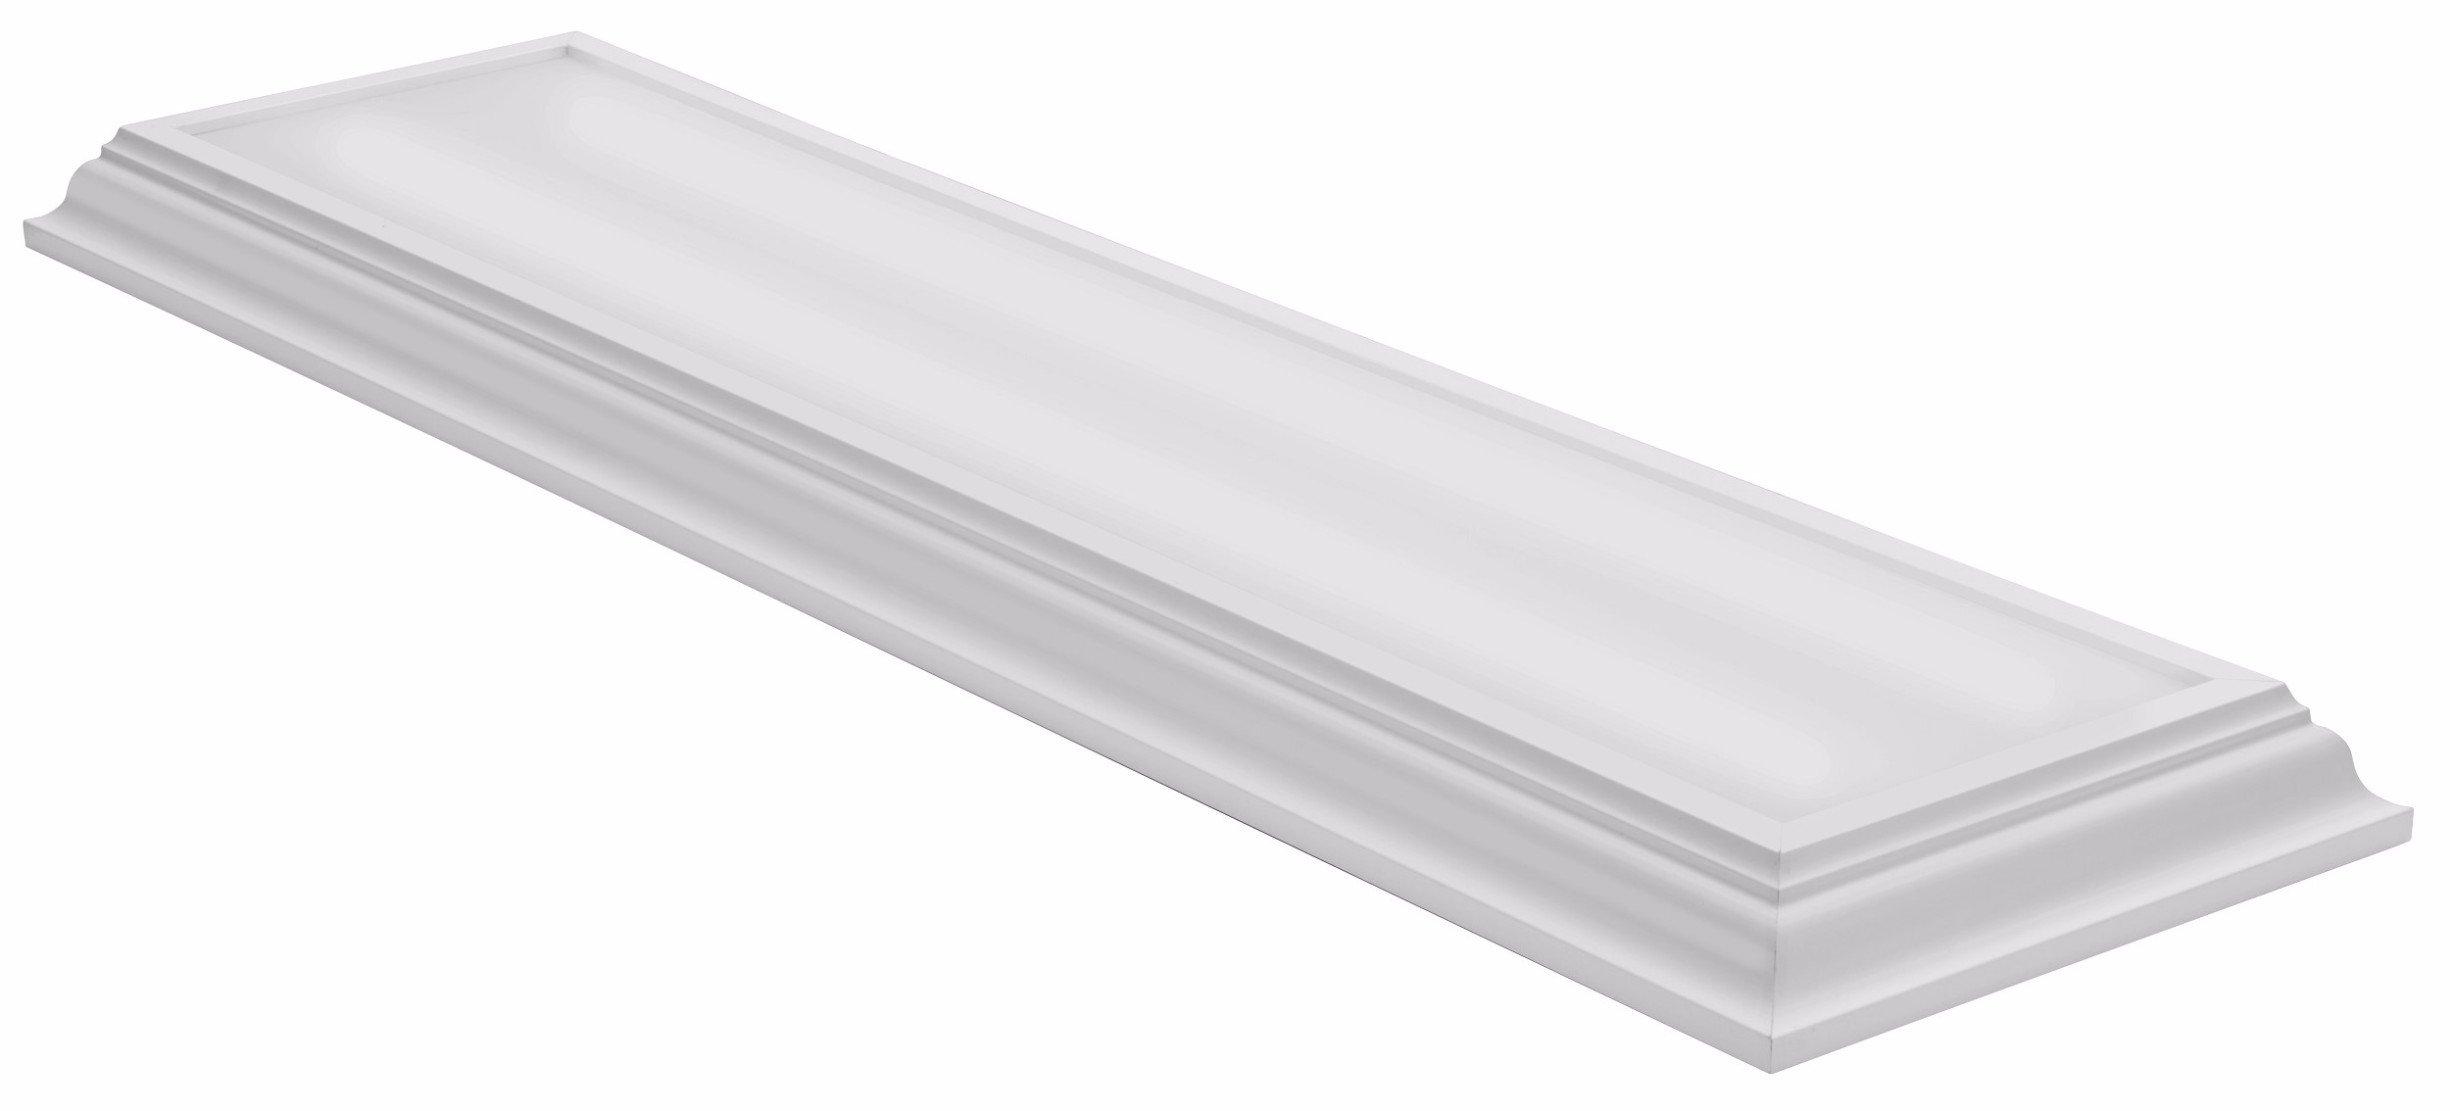 Lithonia Lighting White 4-Ft LED Flush Mount, 4000K, 35.5W, 2,800 Lumens